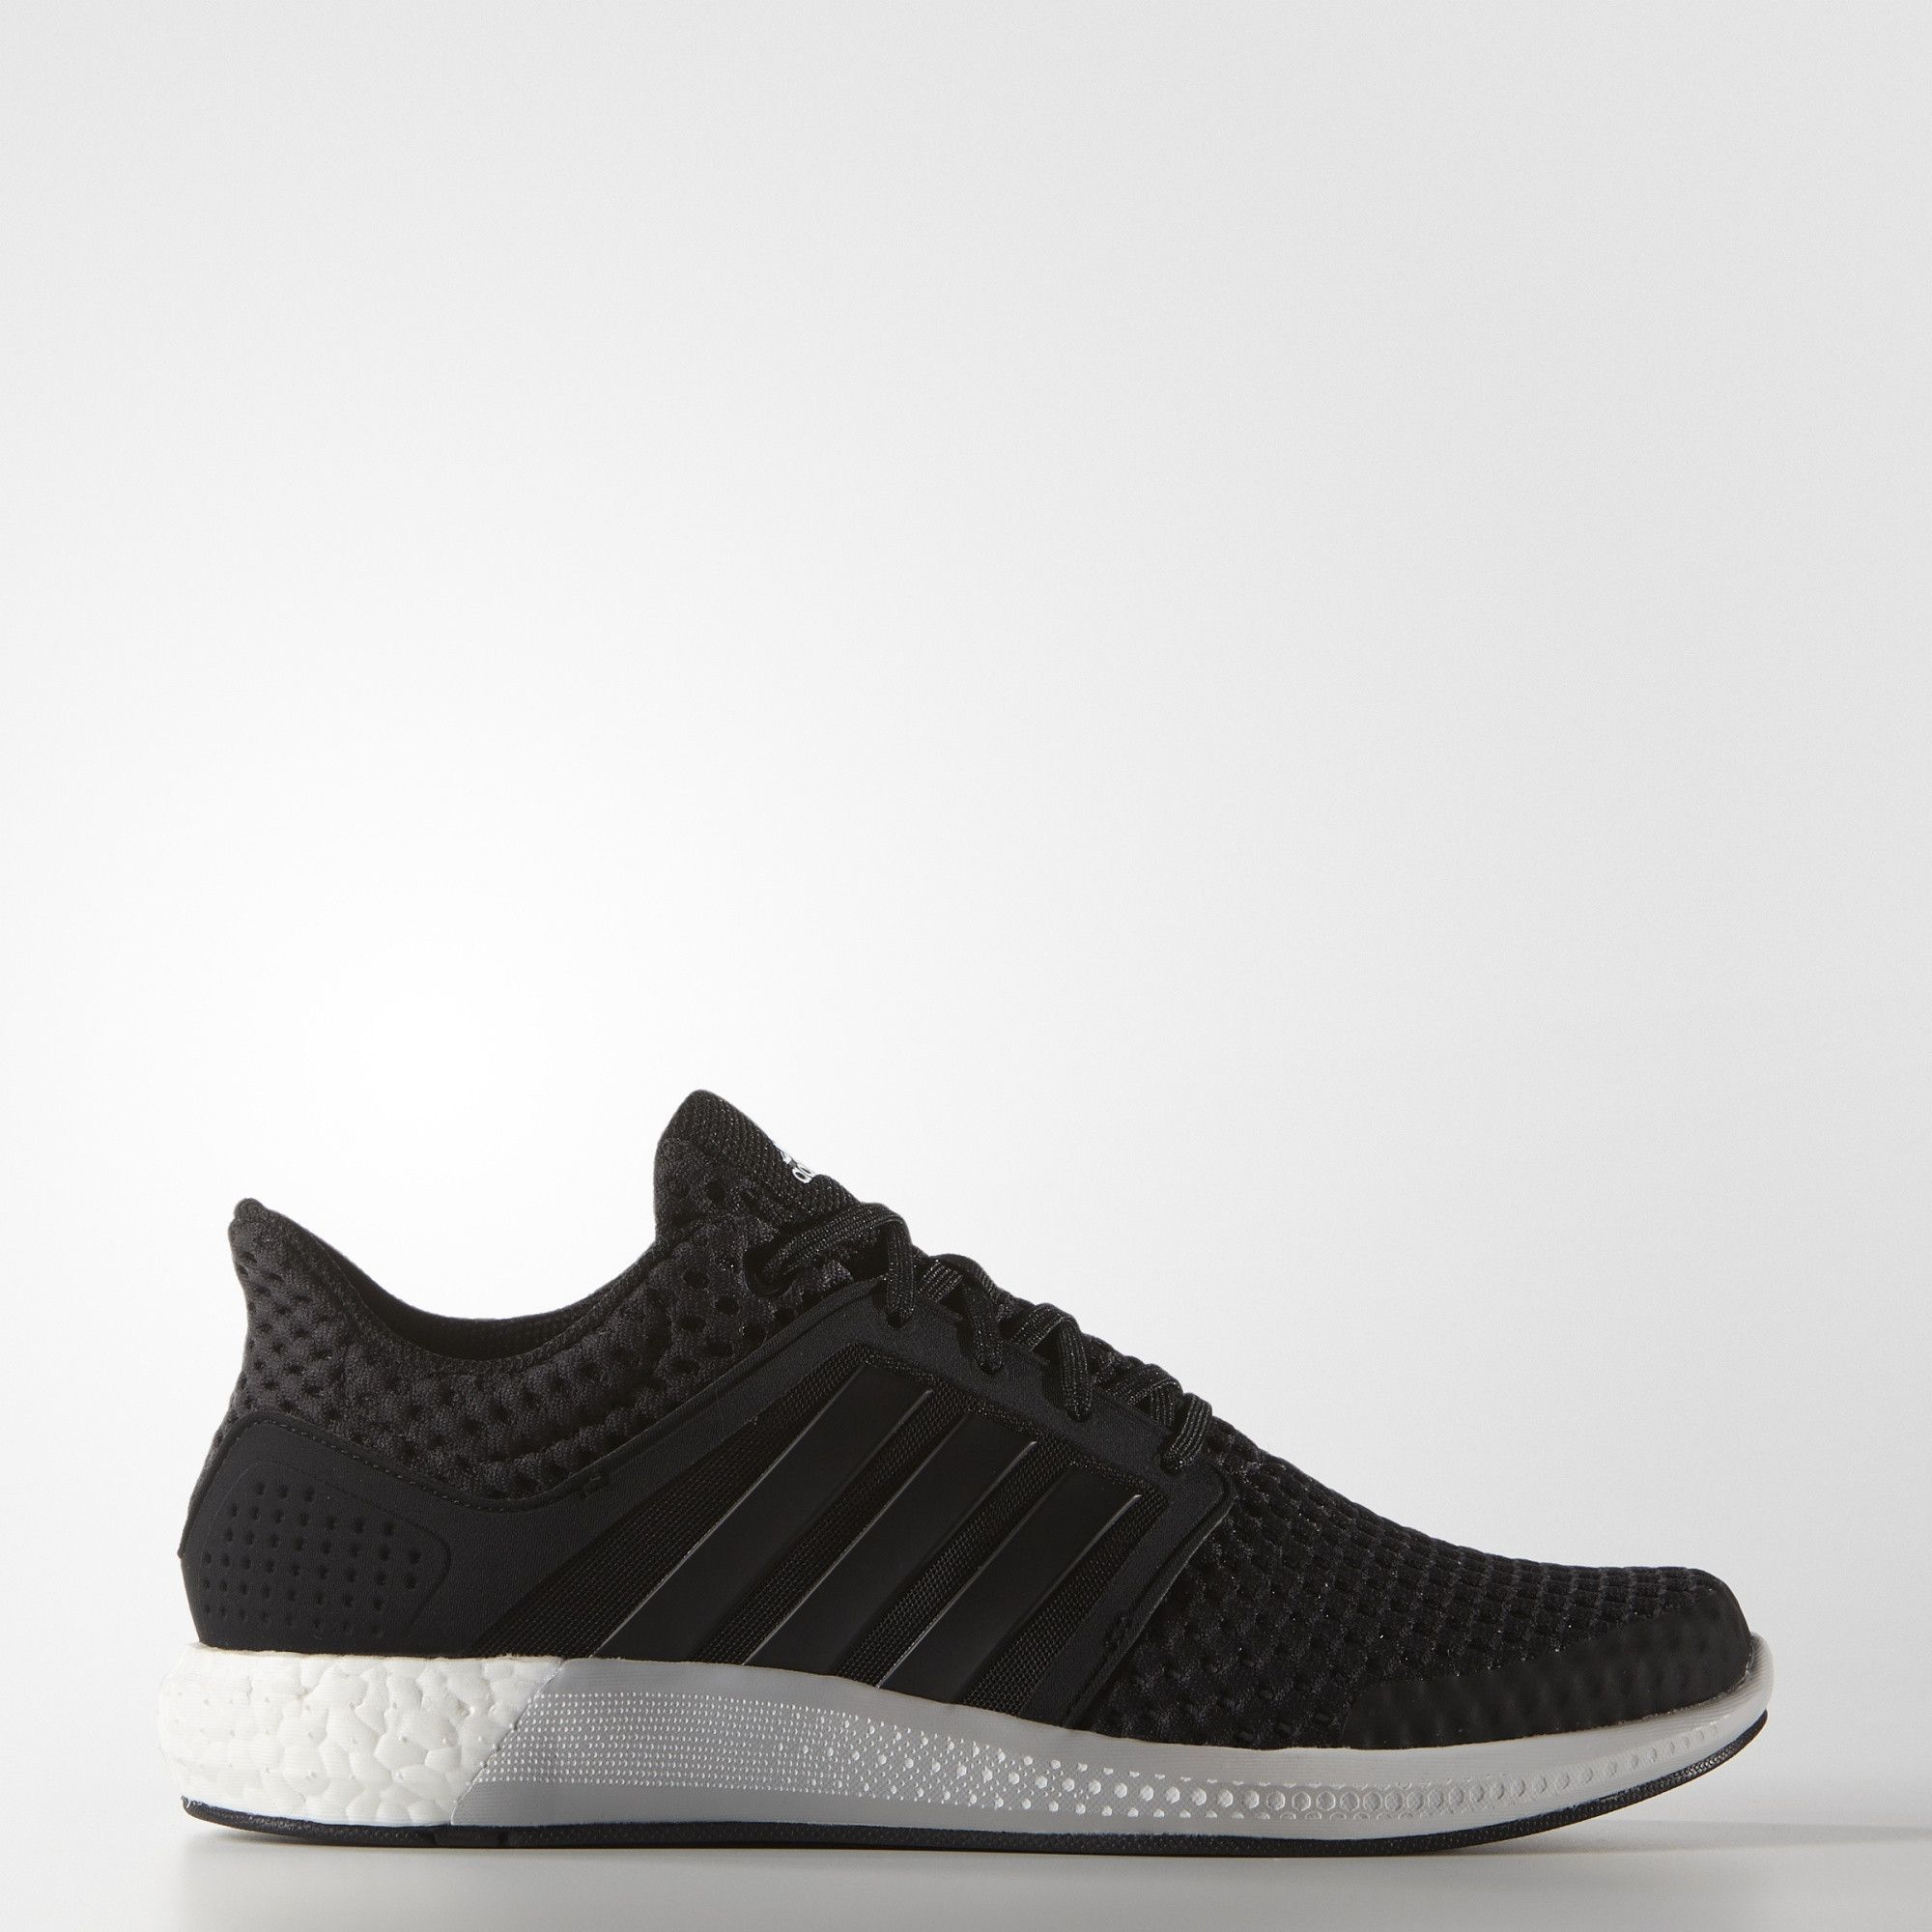 Adidas Nuevo Boost Unisex